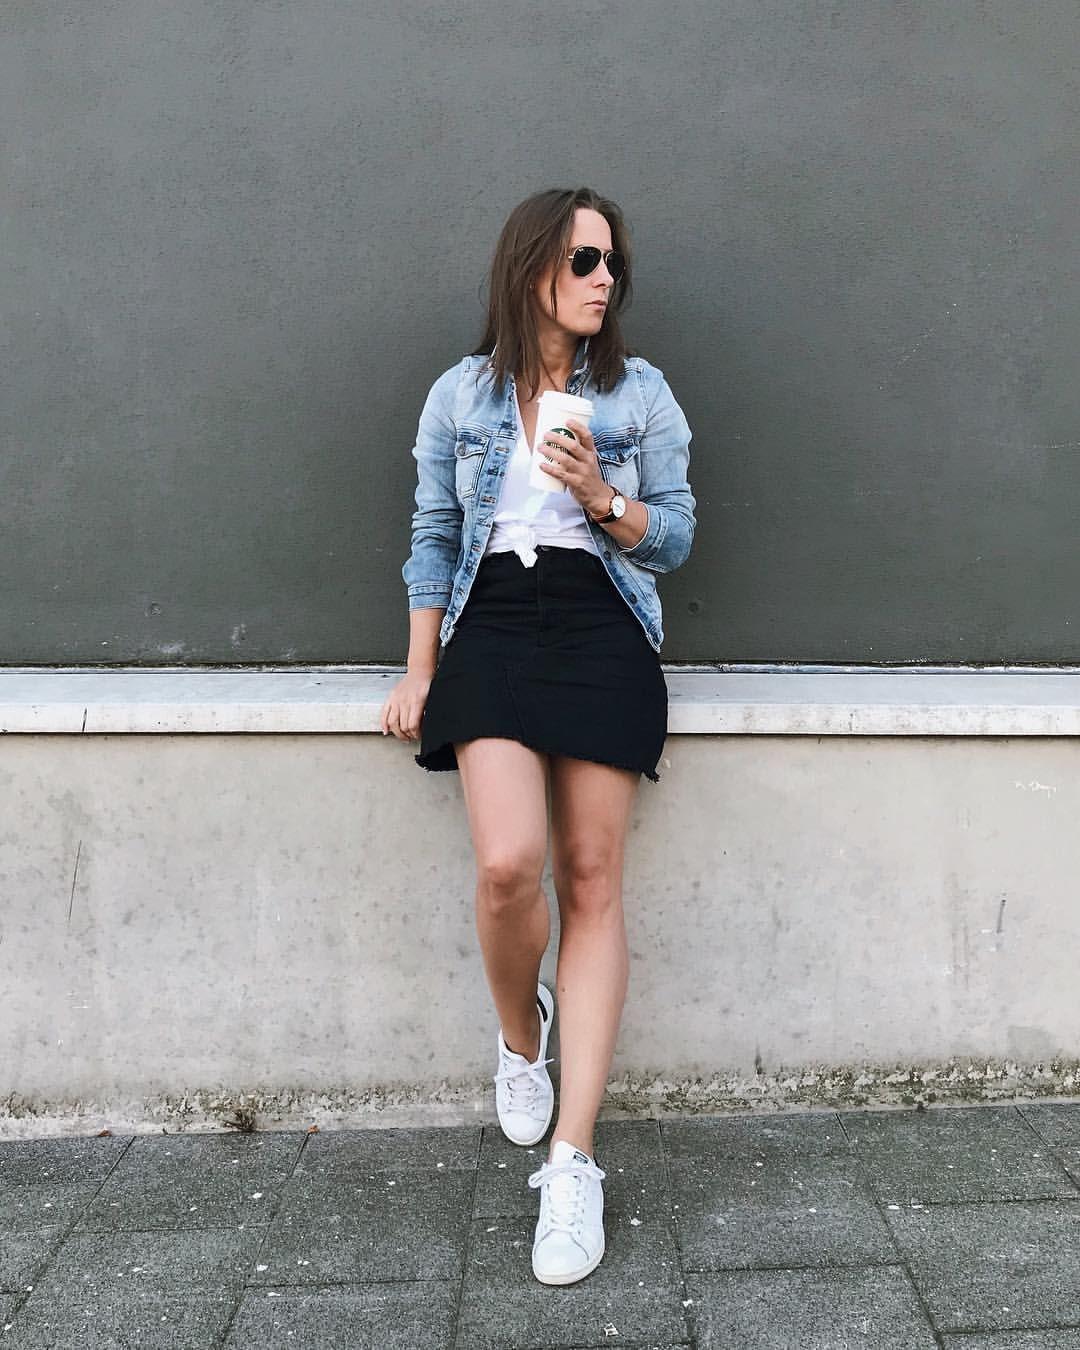 Outfit Denim Jacket White Knotted Basic T Shirt Black Denim Skirt Aviator Sunglasses White Sneakers Brands Zara Sneakers Outfit Black Skirt Outfits Skirts [ 1350 x 1080 Pixel ]